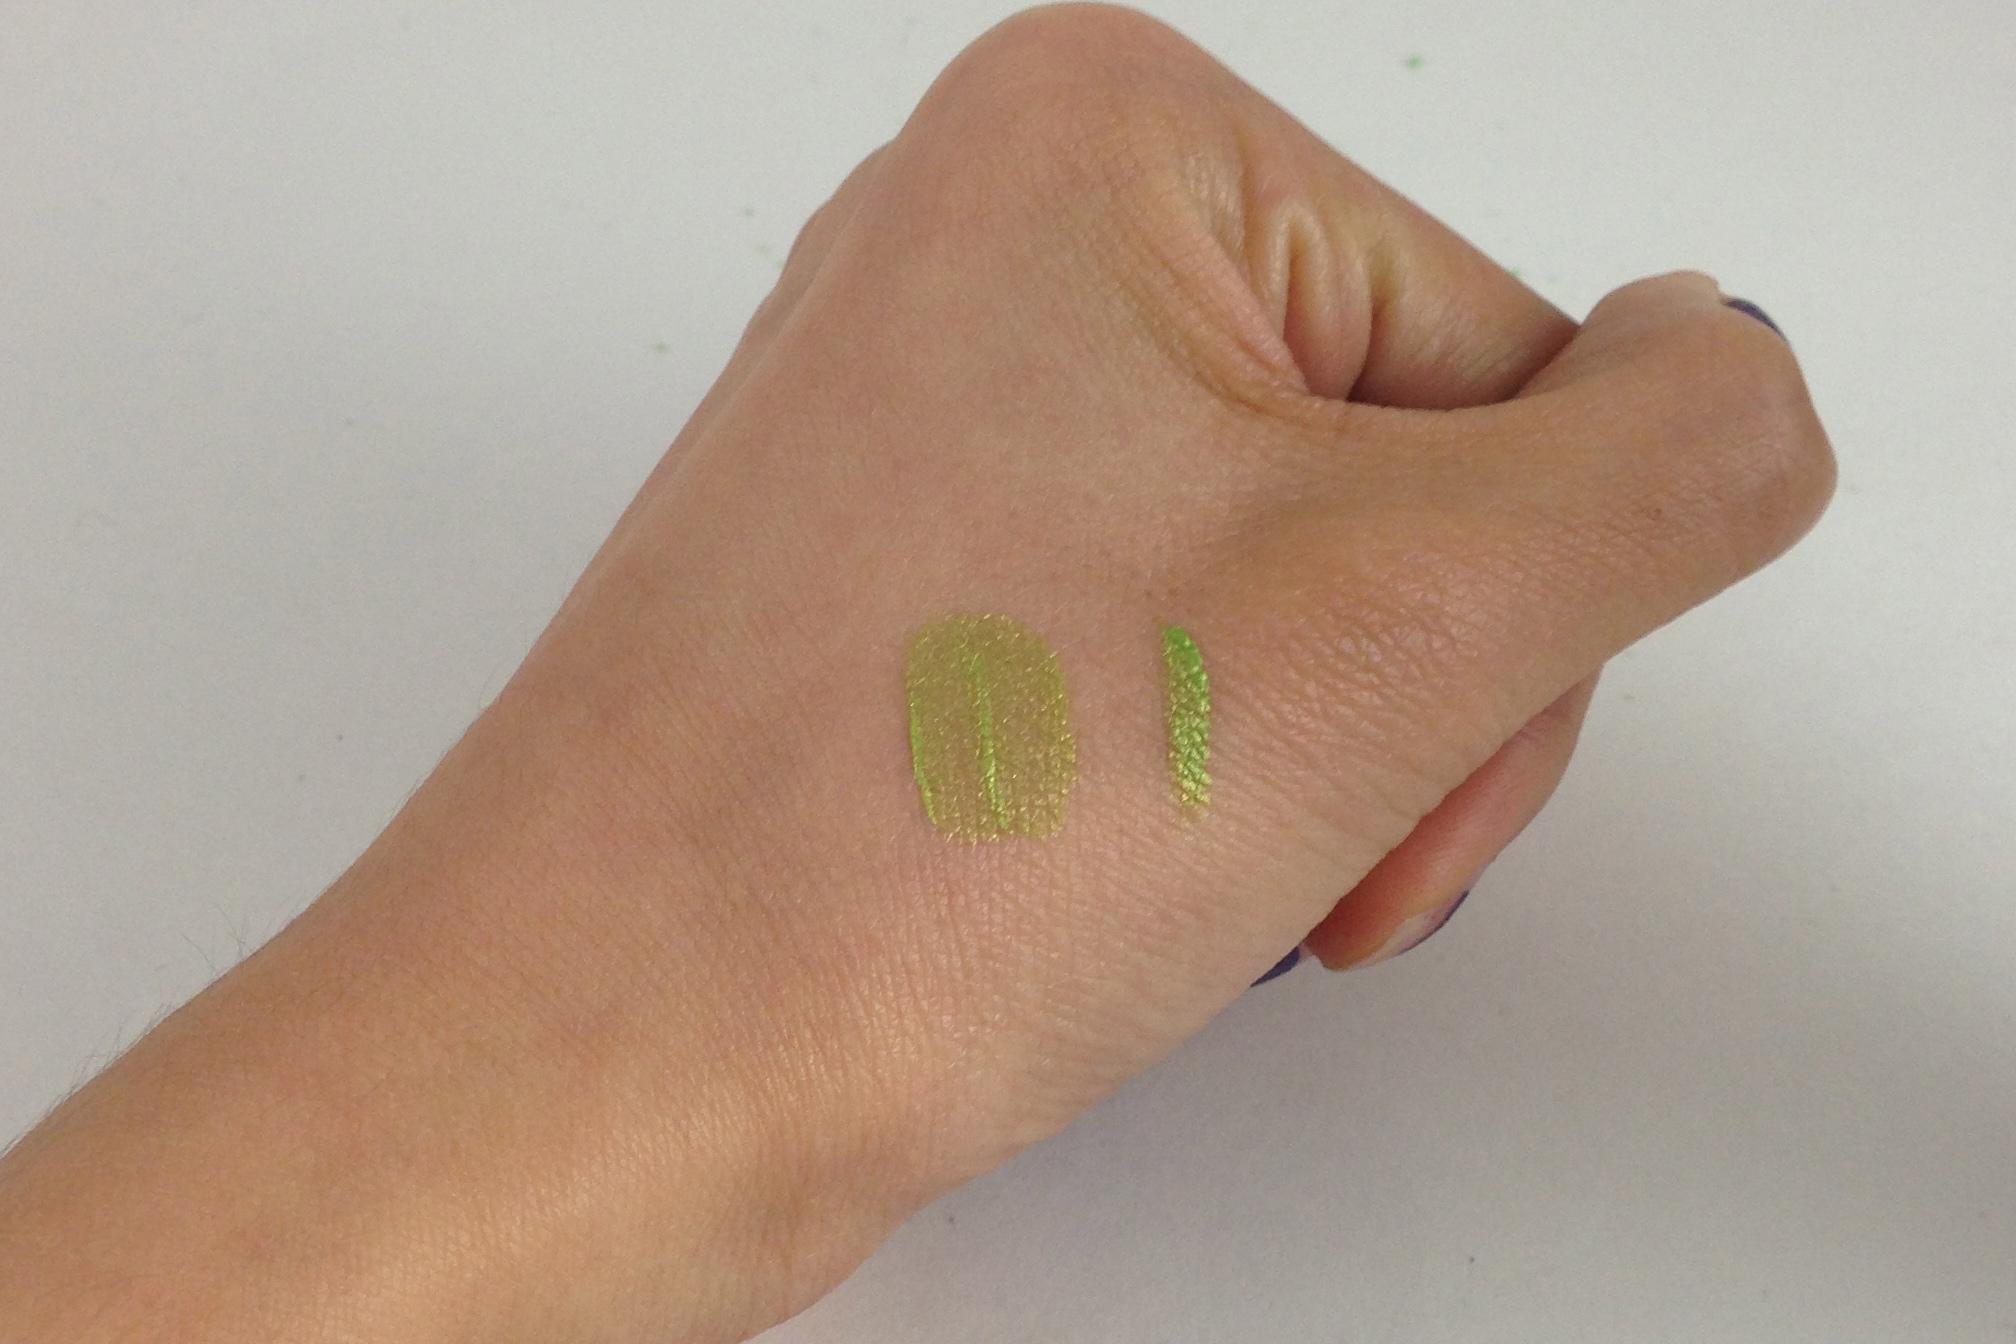 lush intuitive eyeshadow swatch